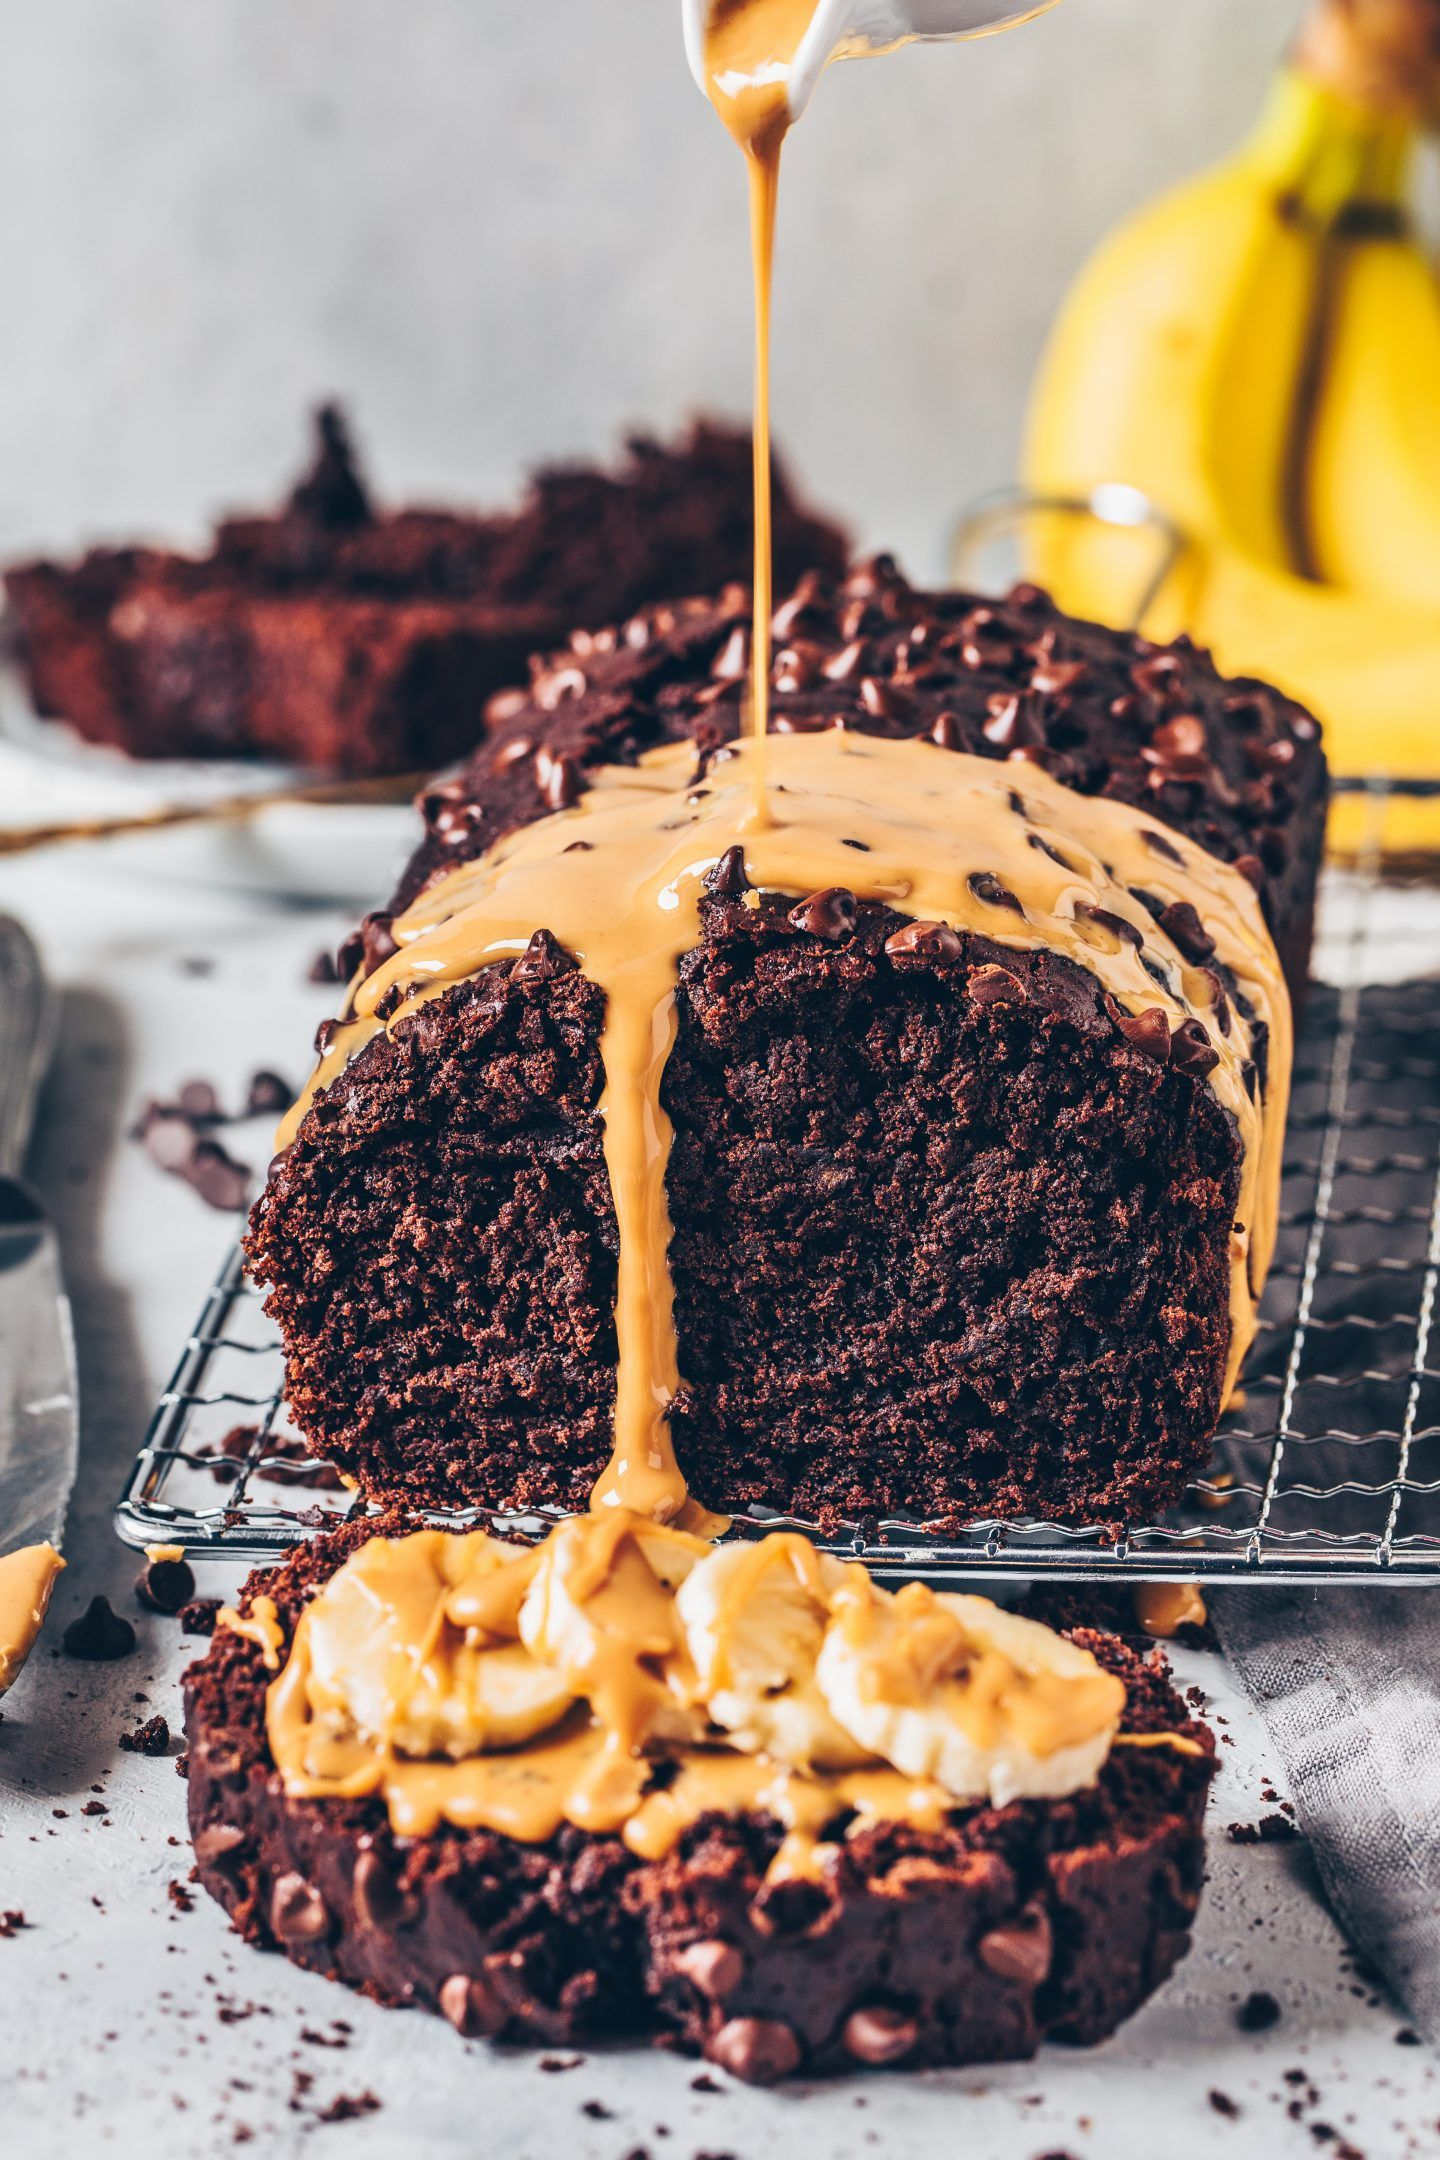 Das beste Vegane Schoko-Bananenbrot - Bianca Zapatka   Rezepte #peanutrecipes